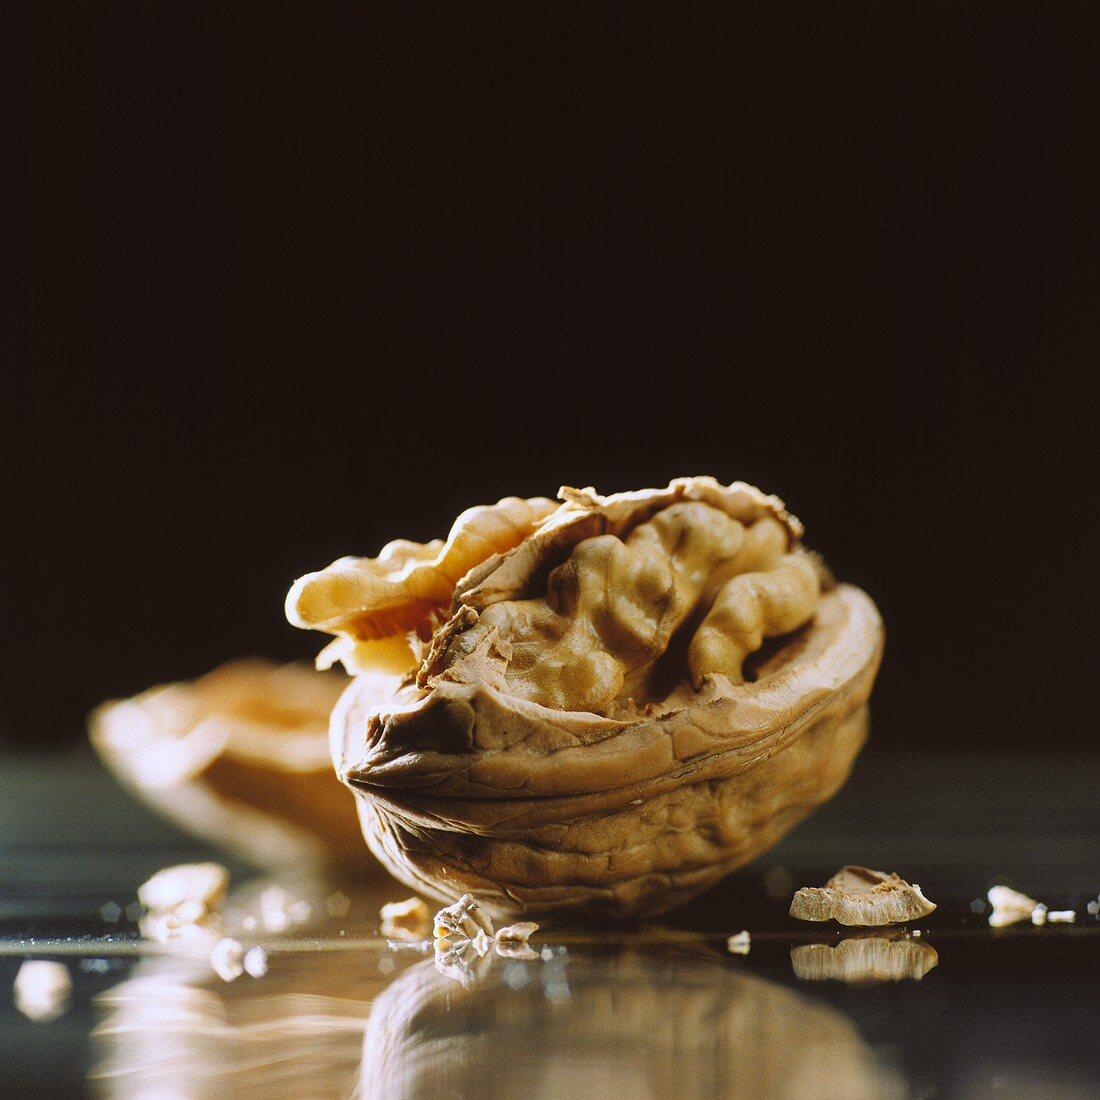 A walnut with broken shell